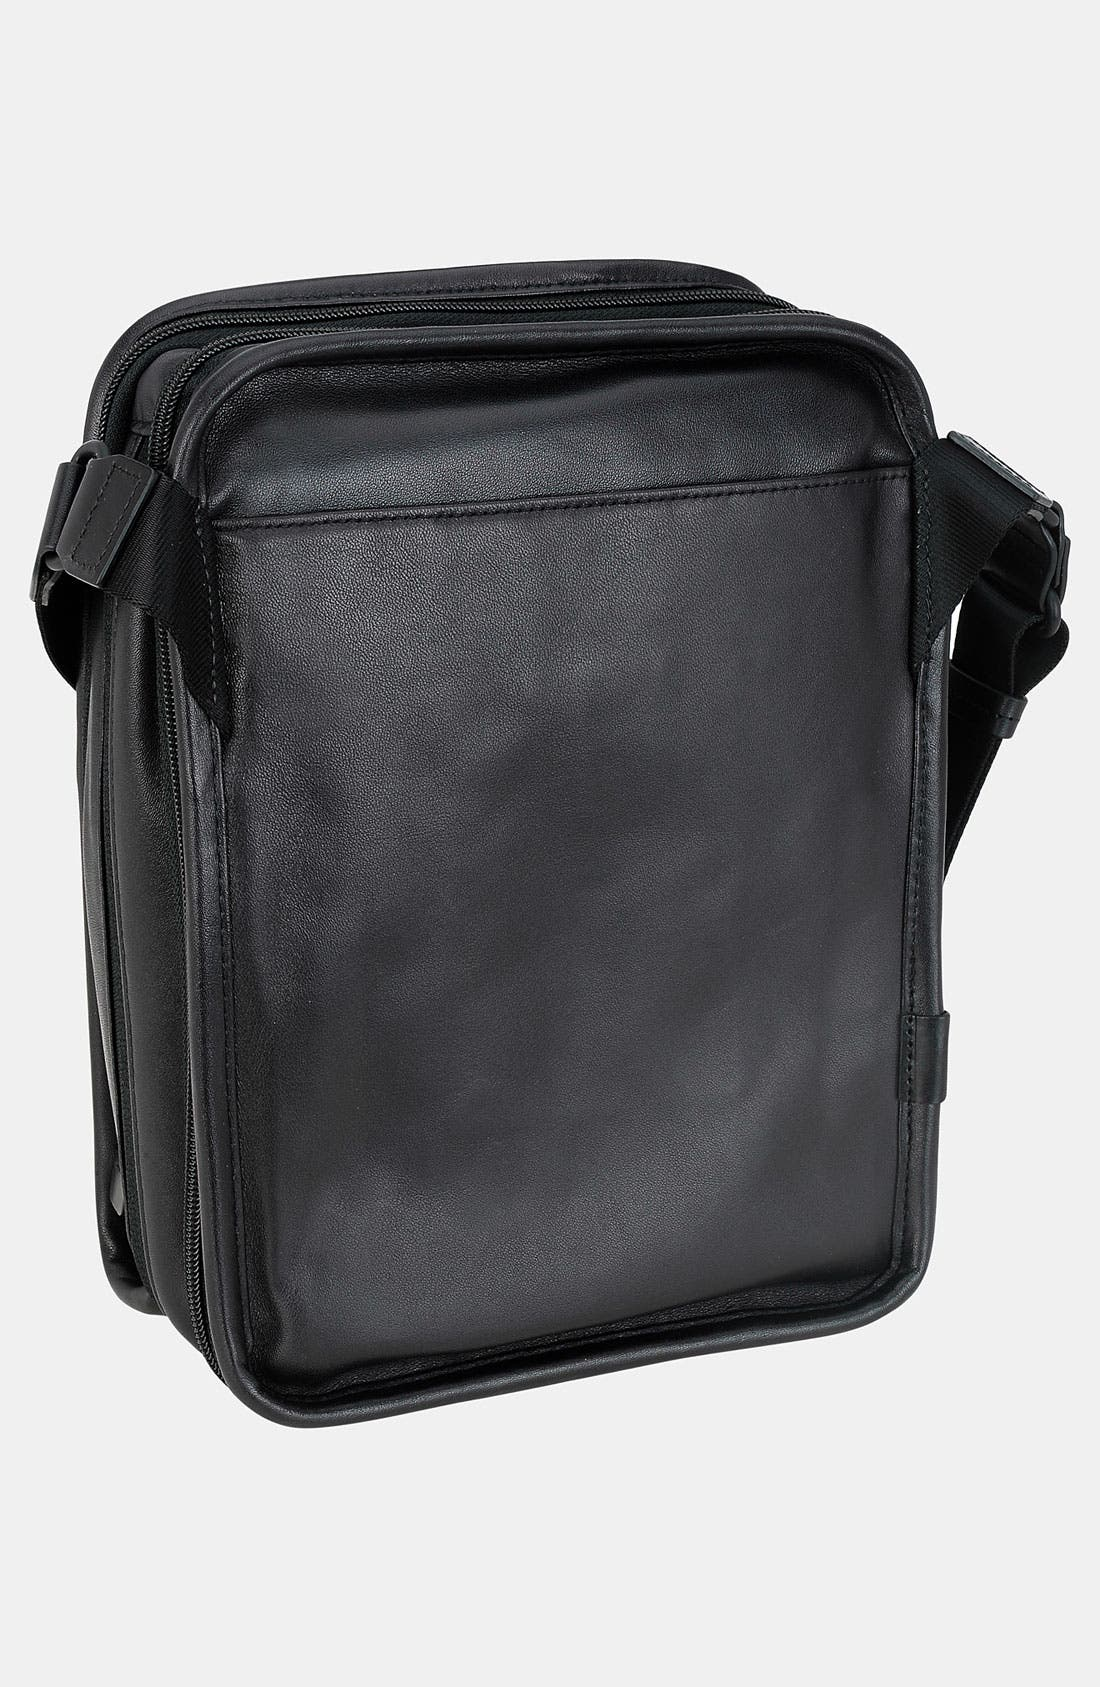 Alternate Image 2  - Tumi 'Alpha' Organizer Travel Leather Tote